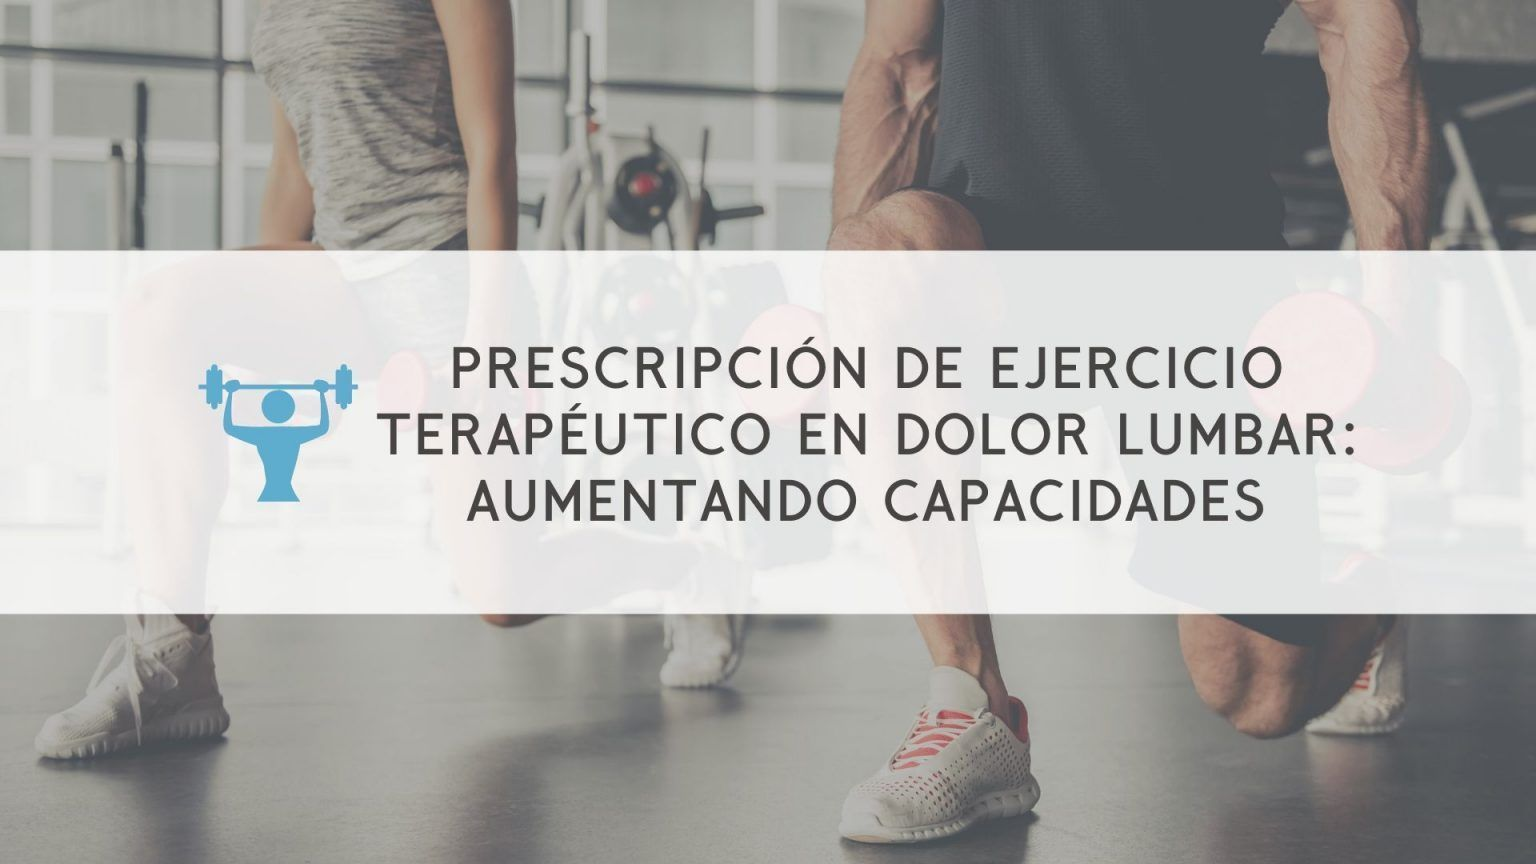 masterclass-prescripcion-ejercicio-terapeutico-dolor-lumbar